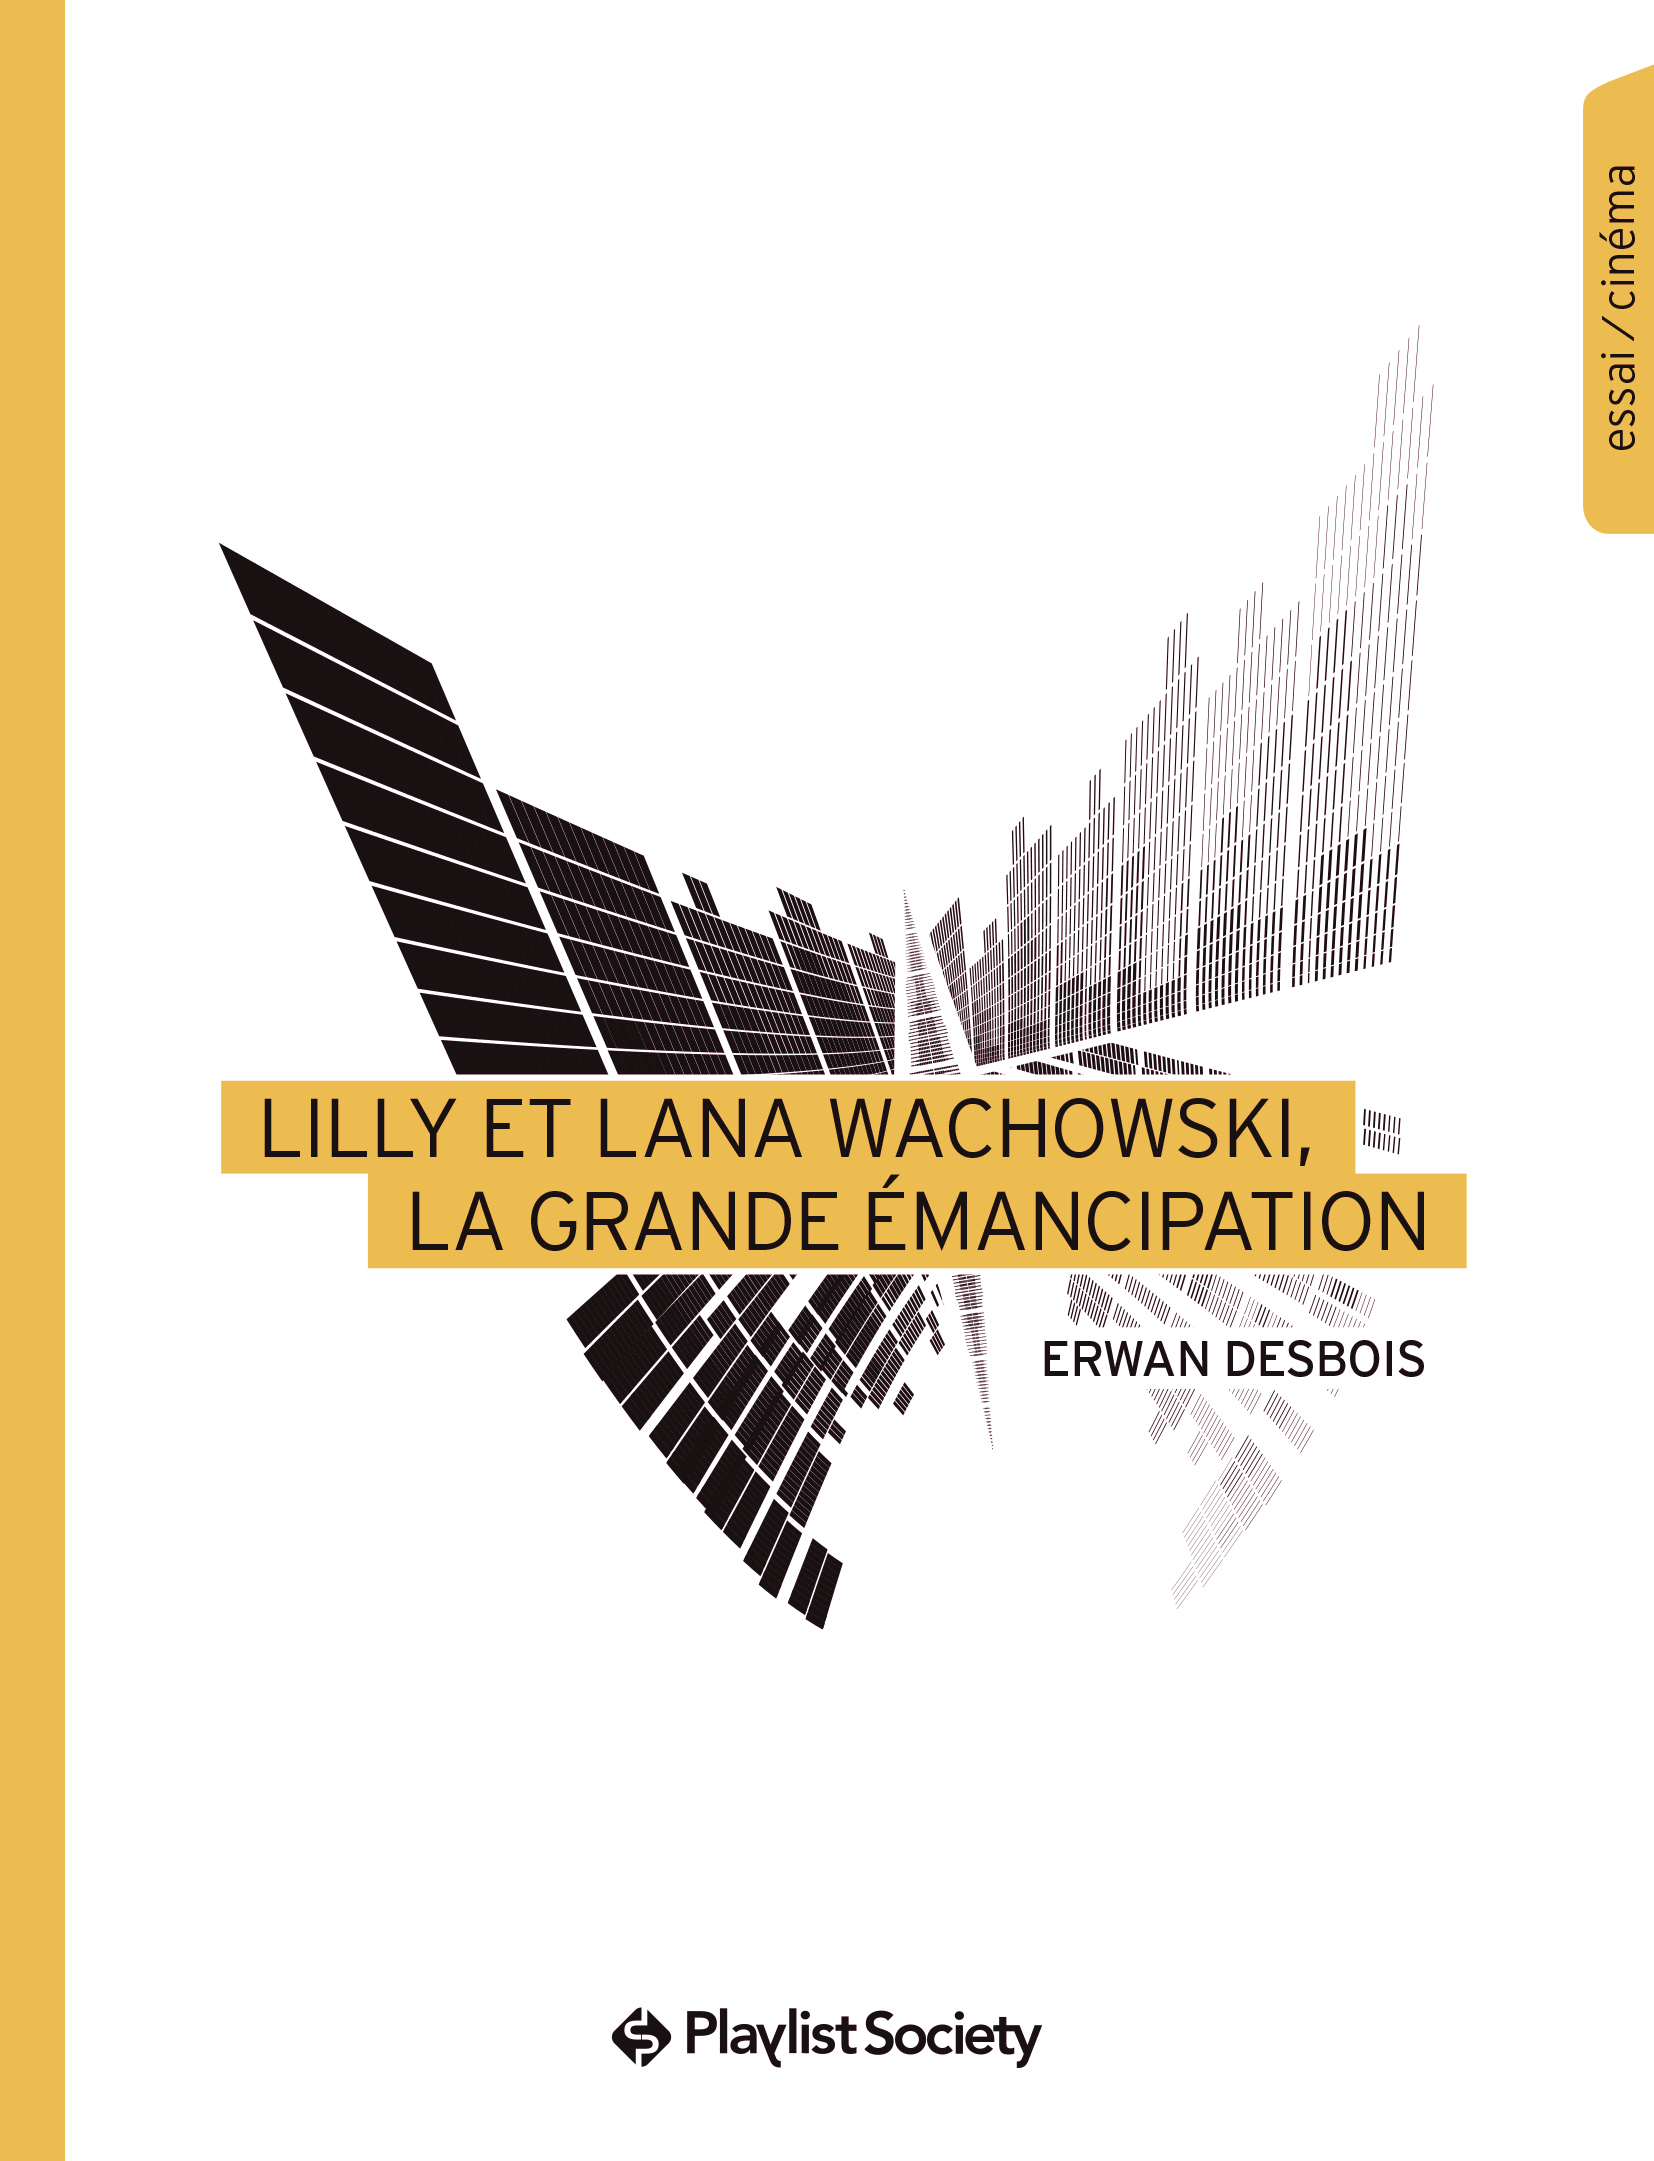 LILLY ET LANA WACHOWSKI, LA GRANDE EMANCIPATION